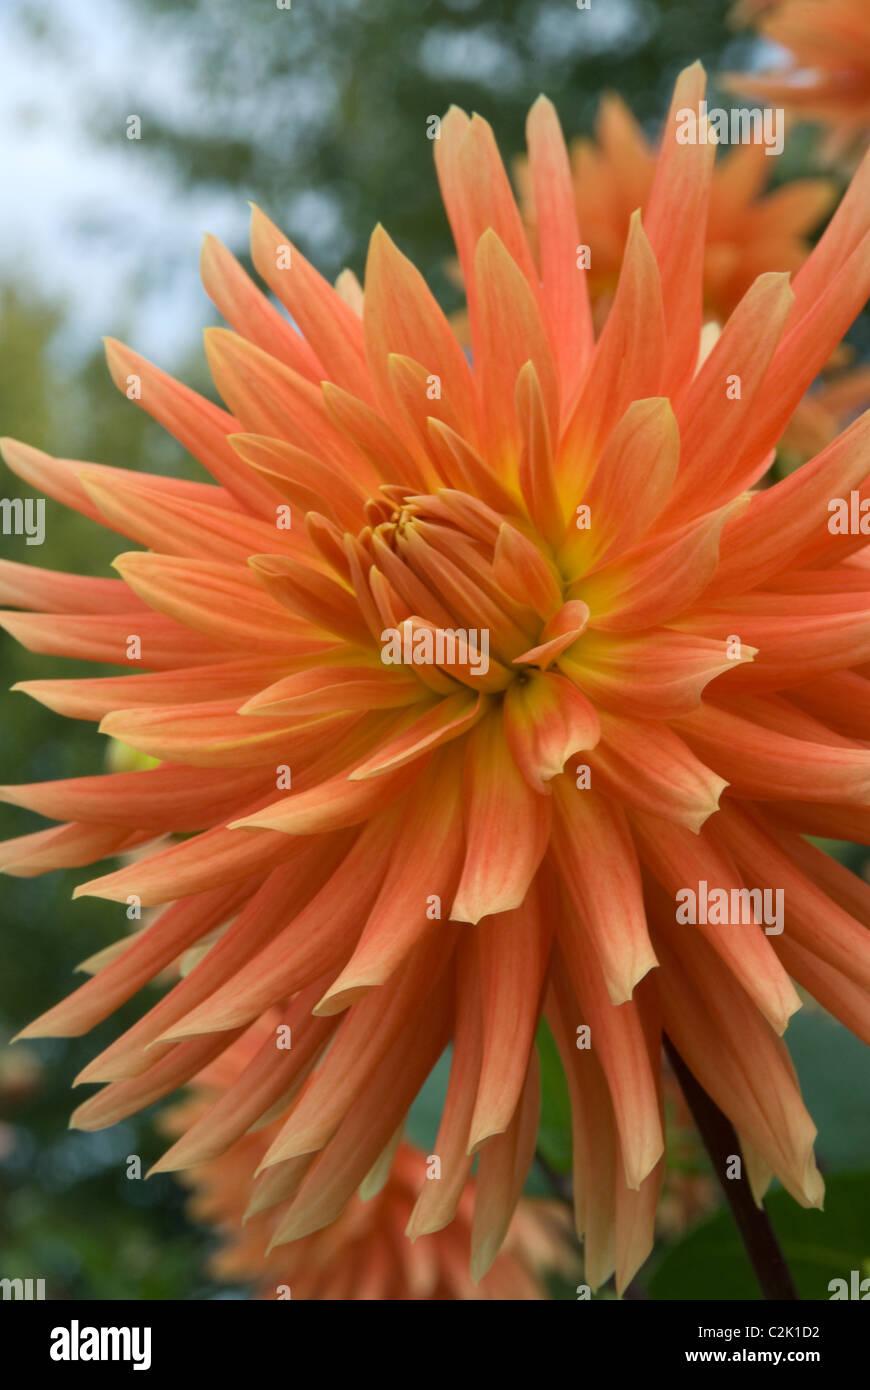 Stock photo of orange dahlia in garden. Stock Photo